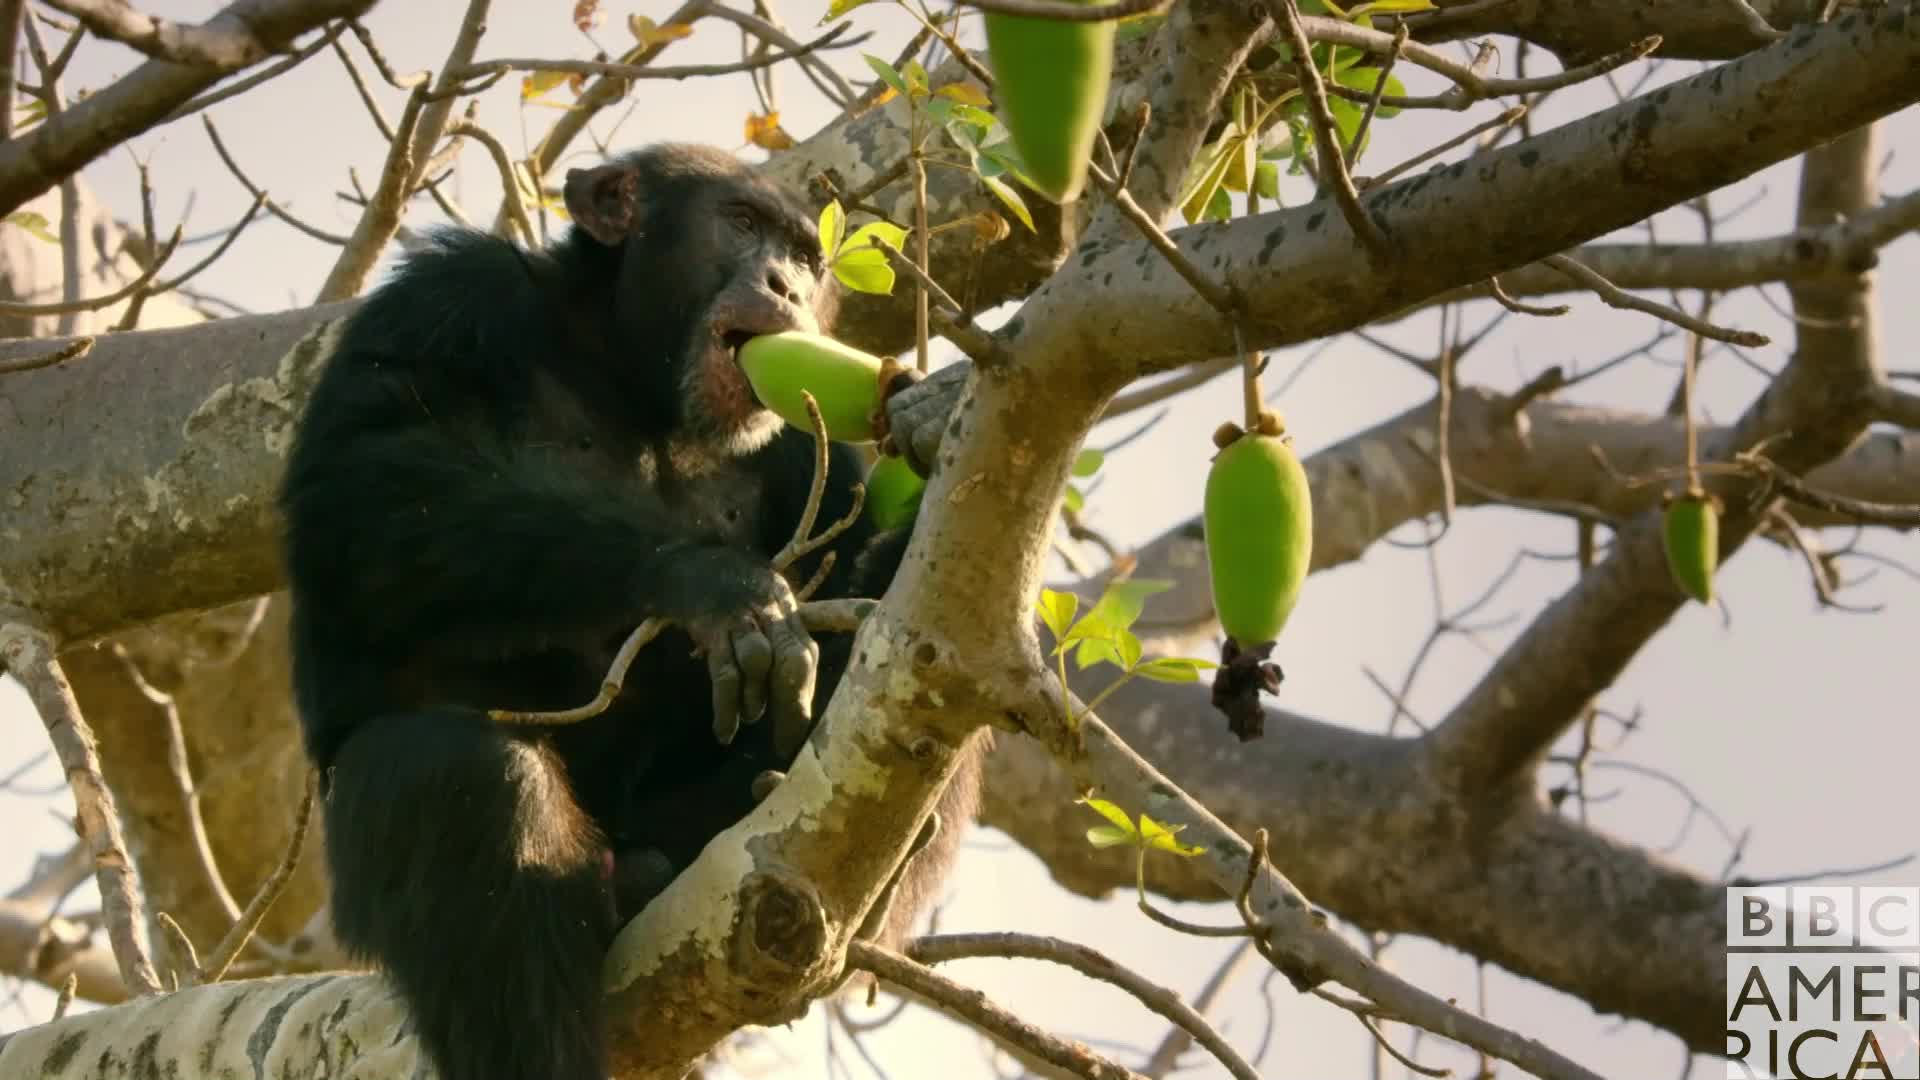 animal, animals, bbc america, bbc america dynasties, bbc america: dynasties, chimp, chimpanzee, chimpanzees, chimps, dynasties, Dynasties Chimp David Eating GIFs